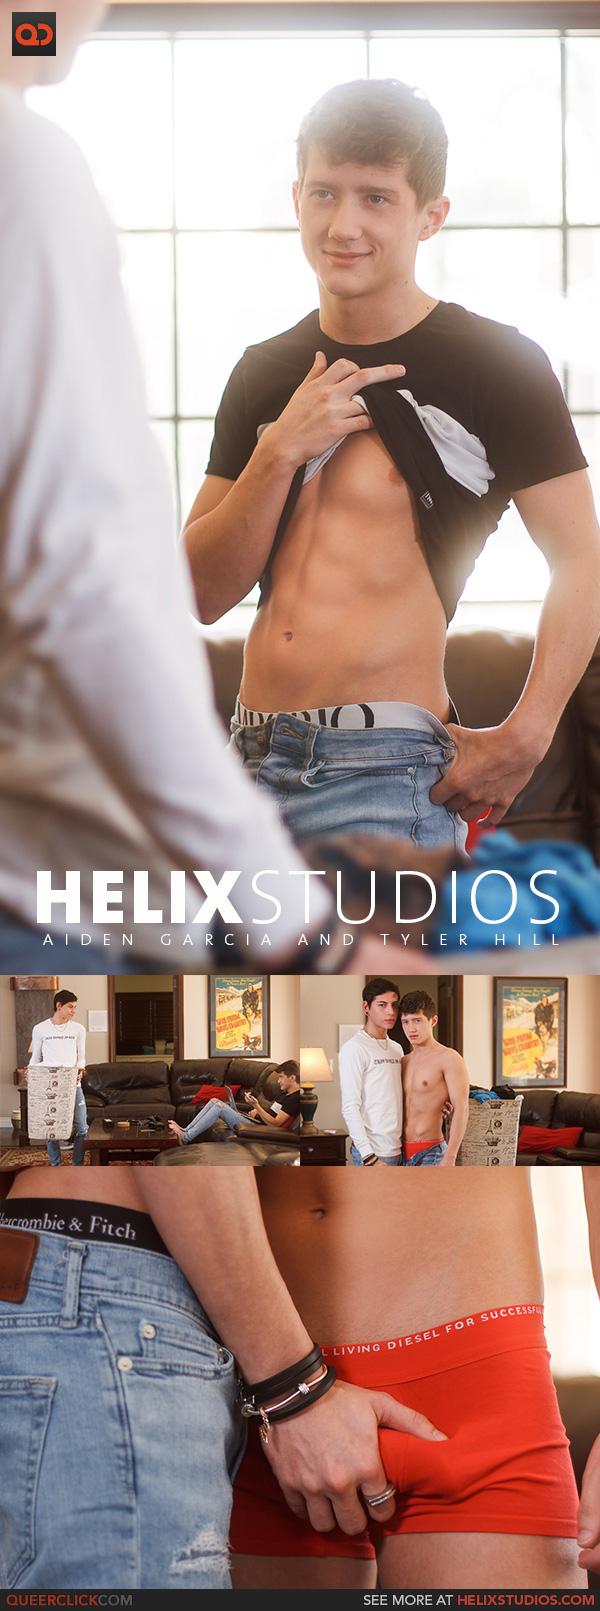 Helix Studios: Aiden Garcia and Tyler Hill